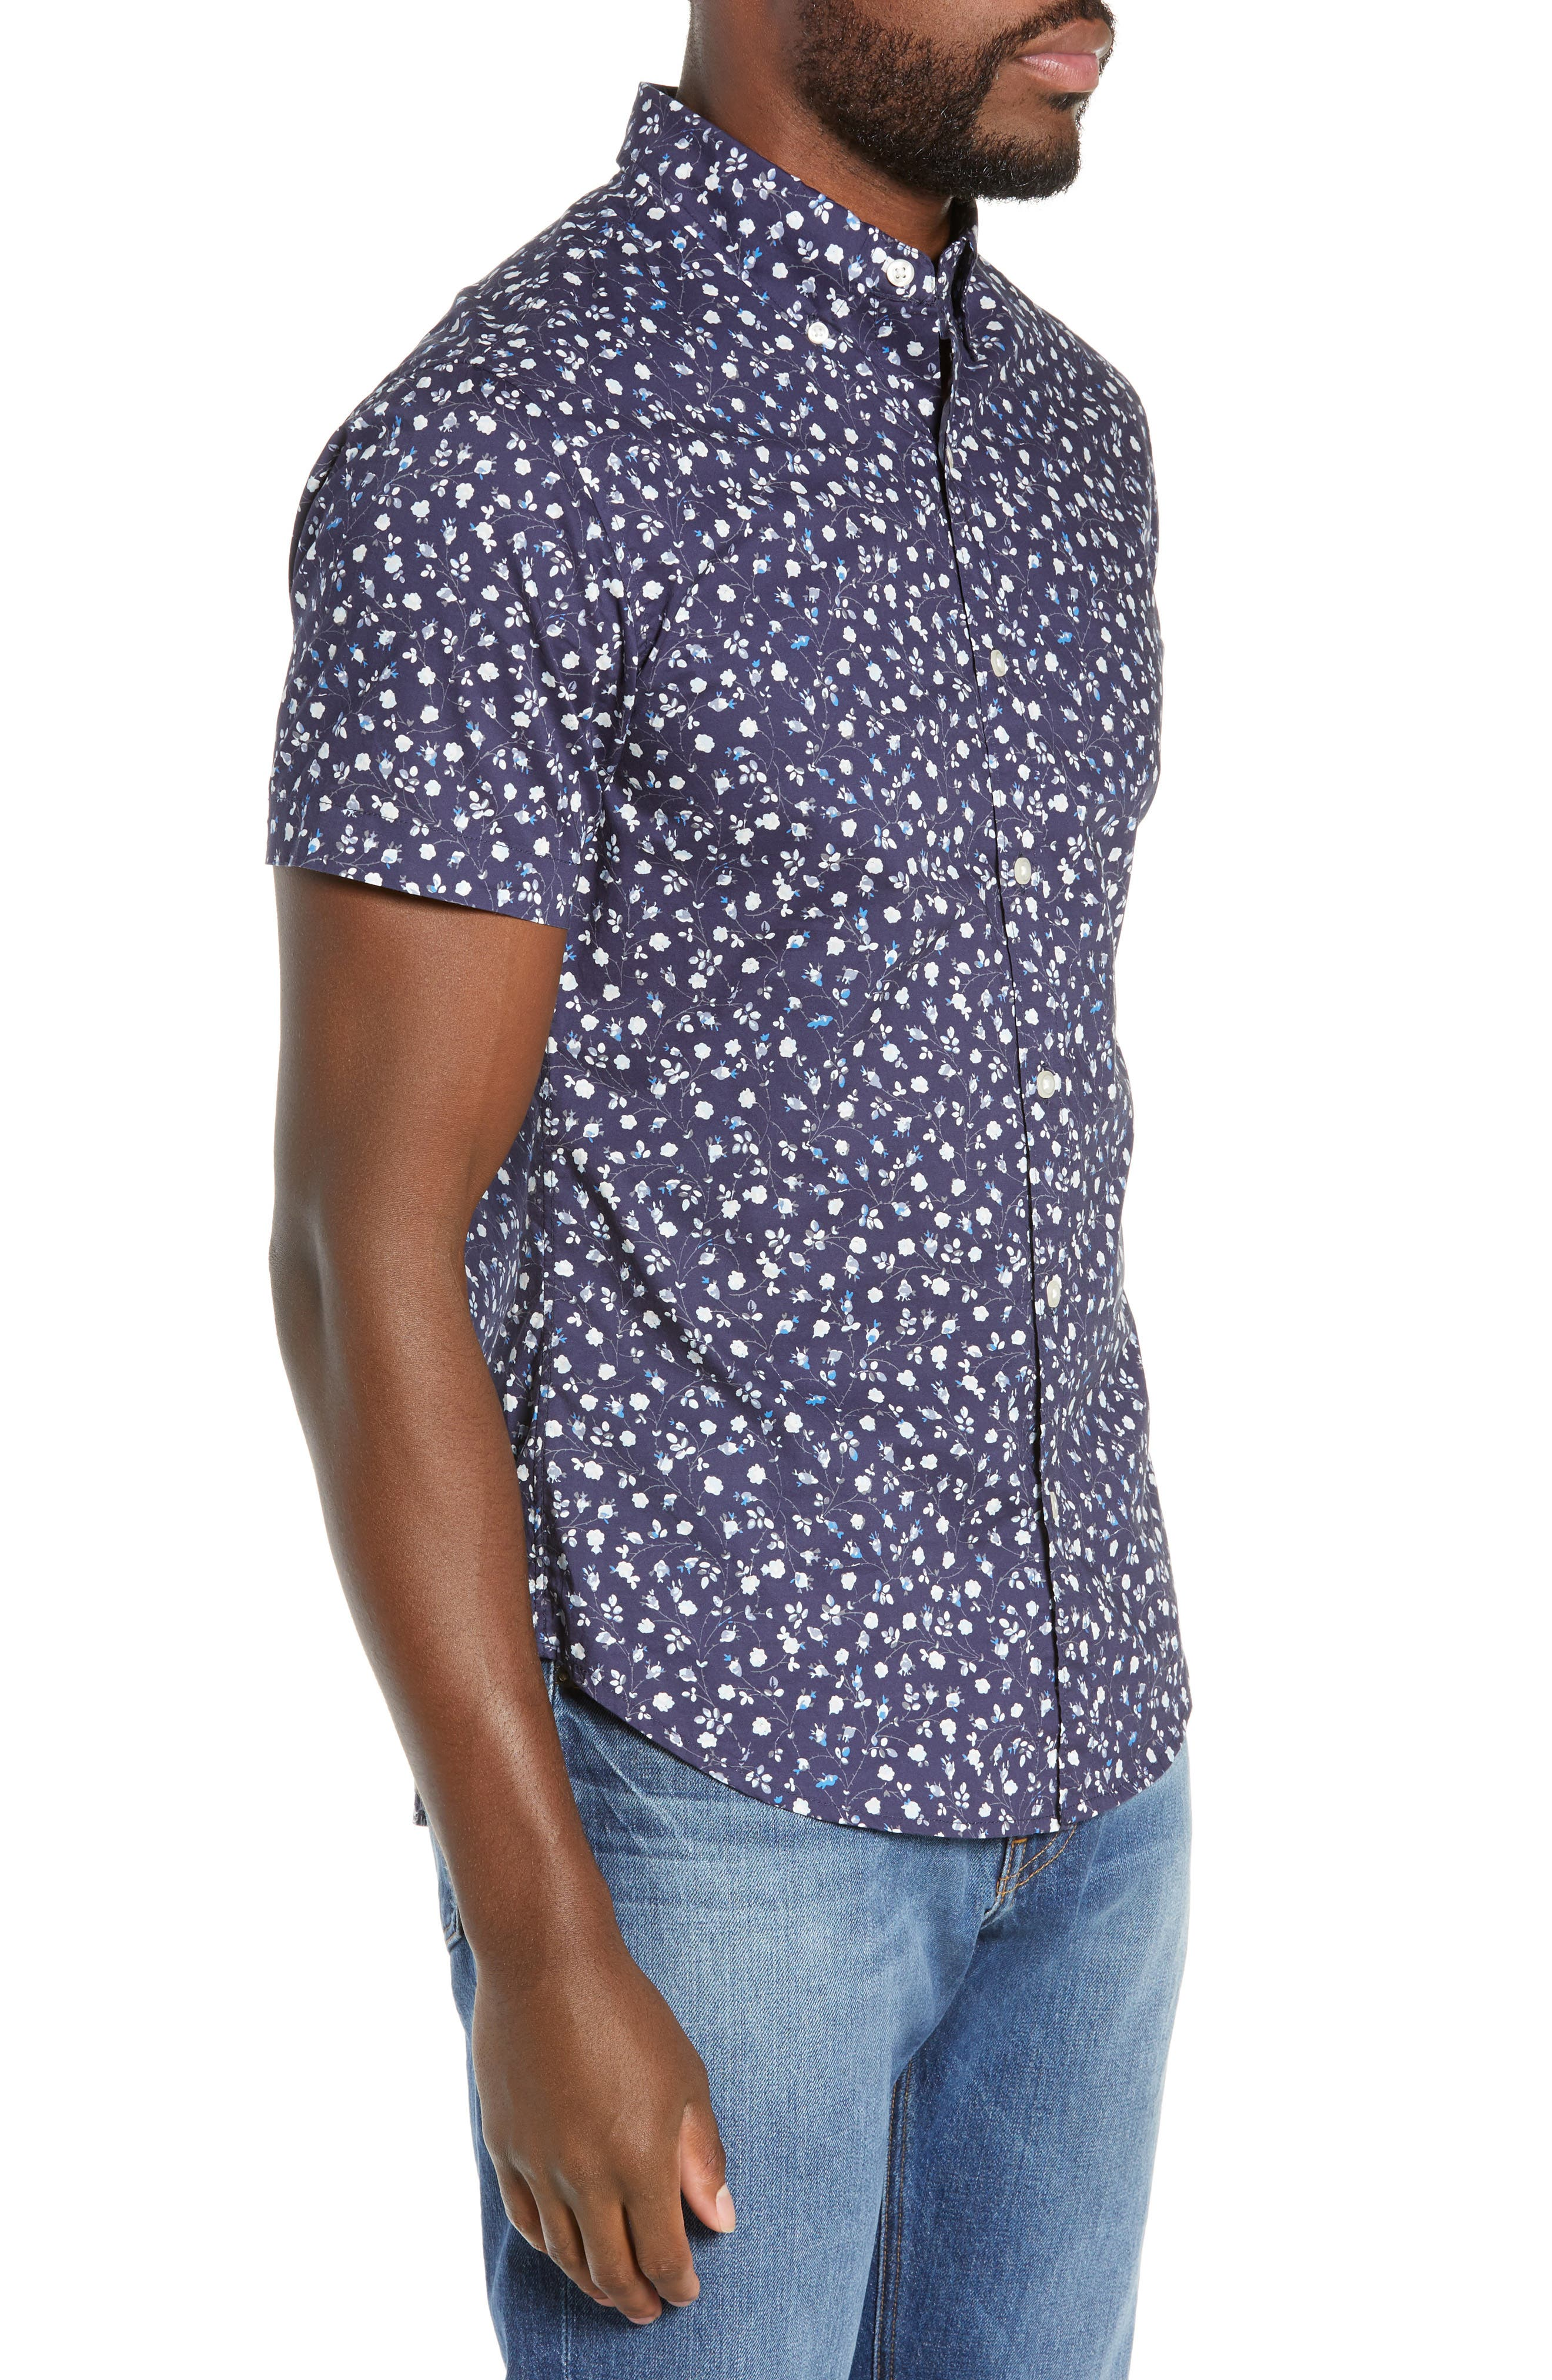 BONOBOS, Riviera Slim Fit Floral Print Sport Shirt, Alternate thumbnail 4, color, BLUE FLORAL